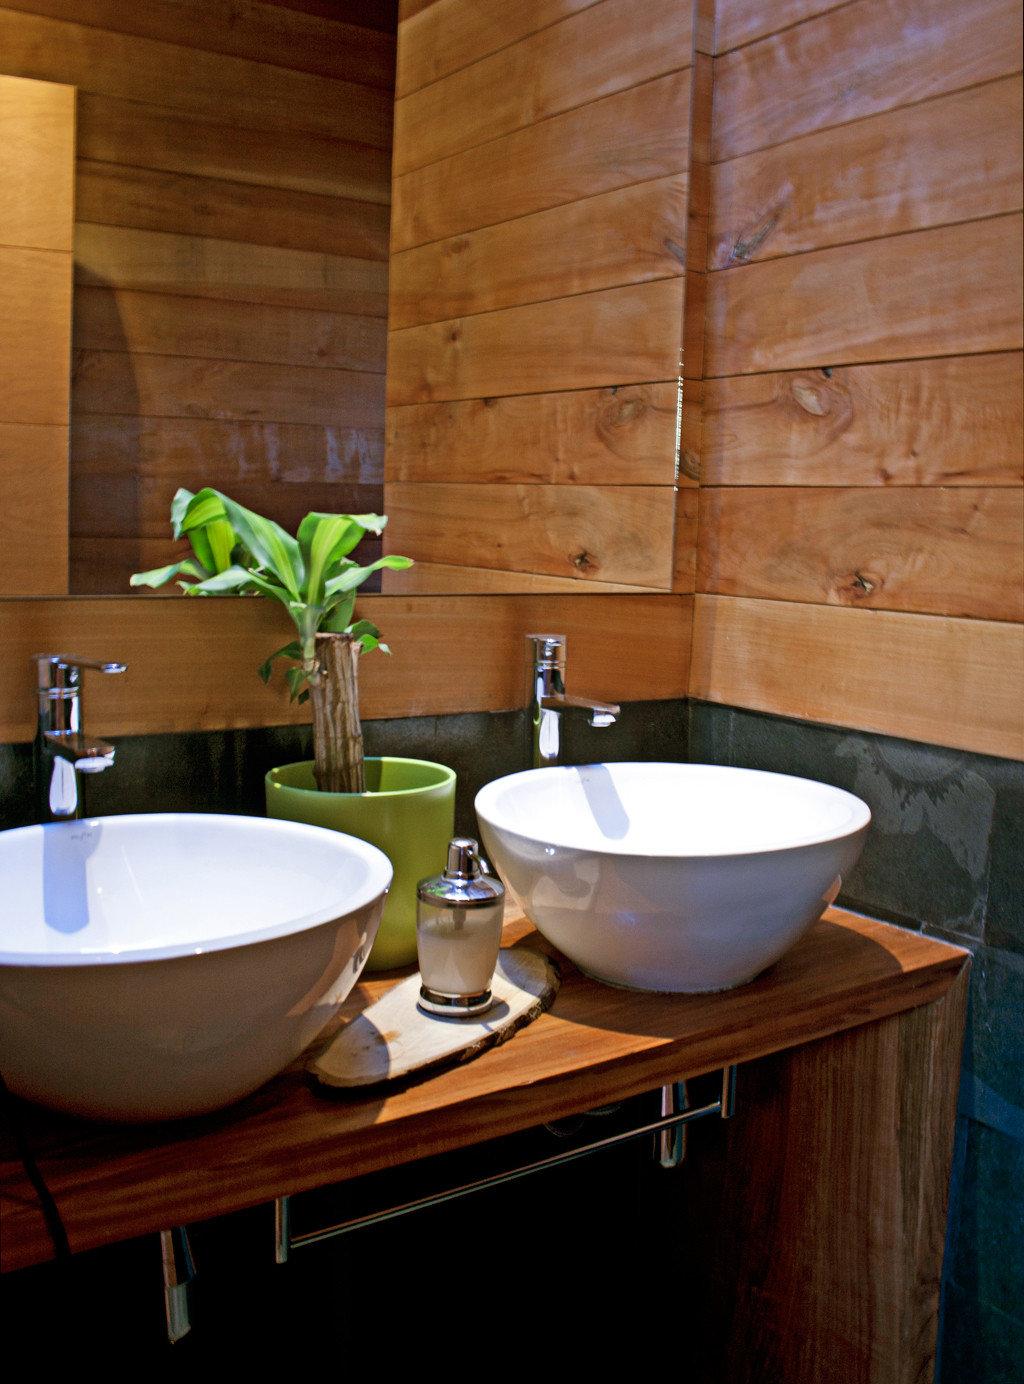 Bath Lodge Romantic Rustic bathroom sink plumbing fixture countertop home Kitchen bathtub plant tub